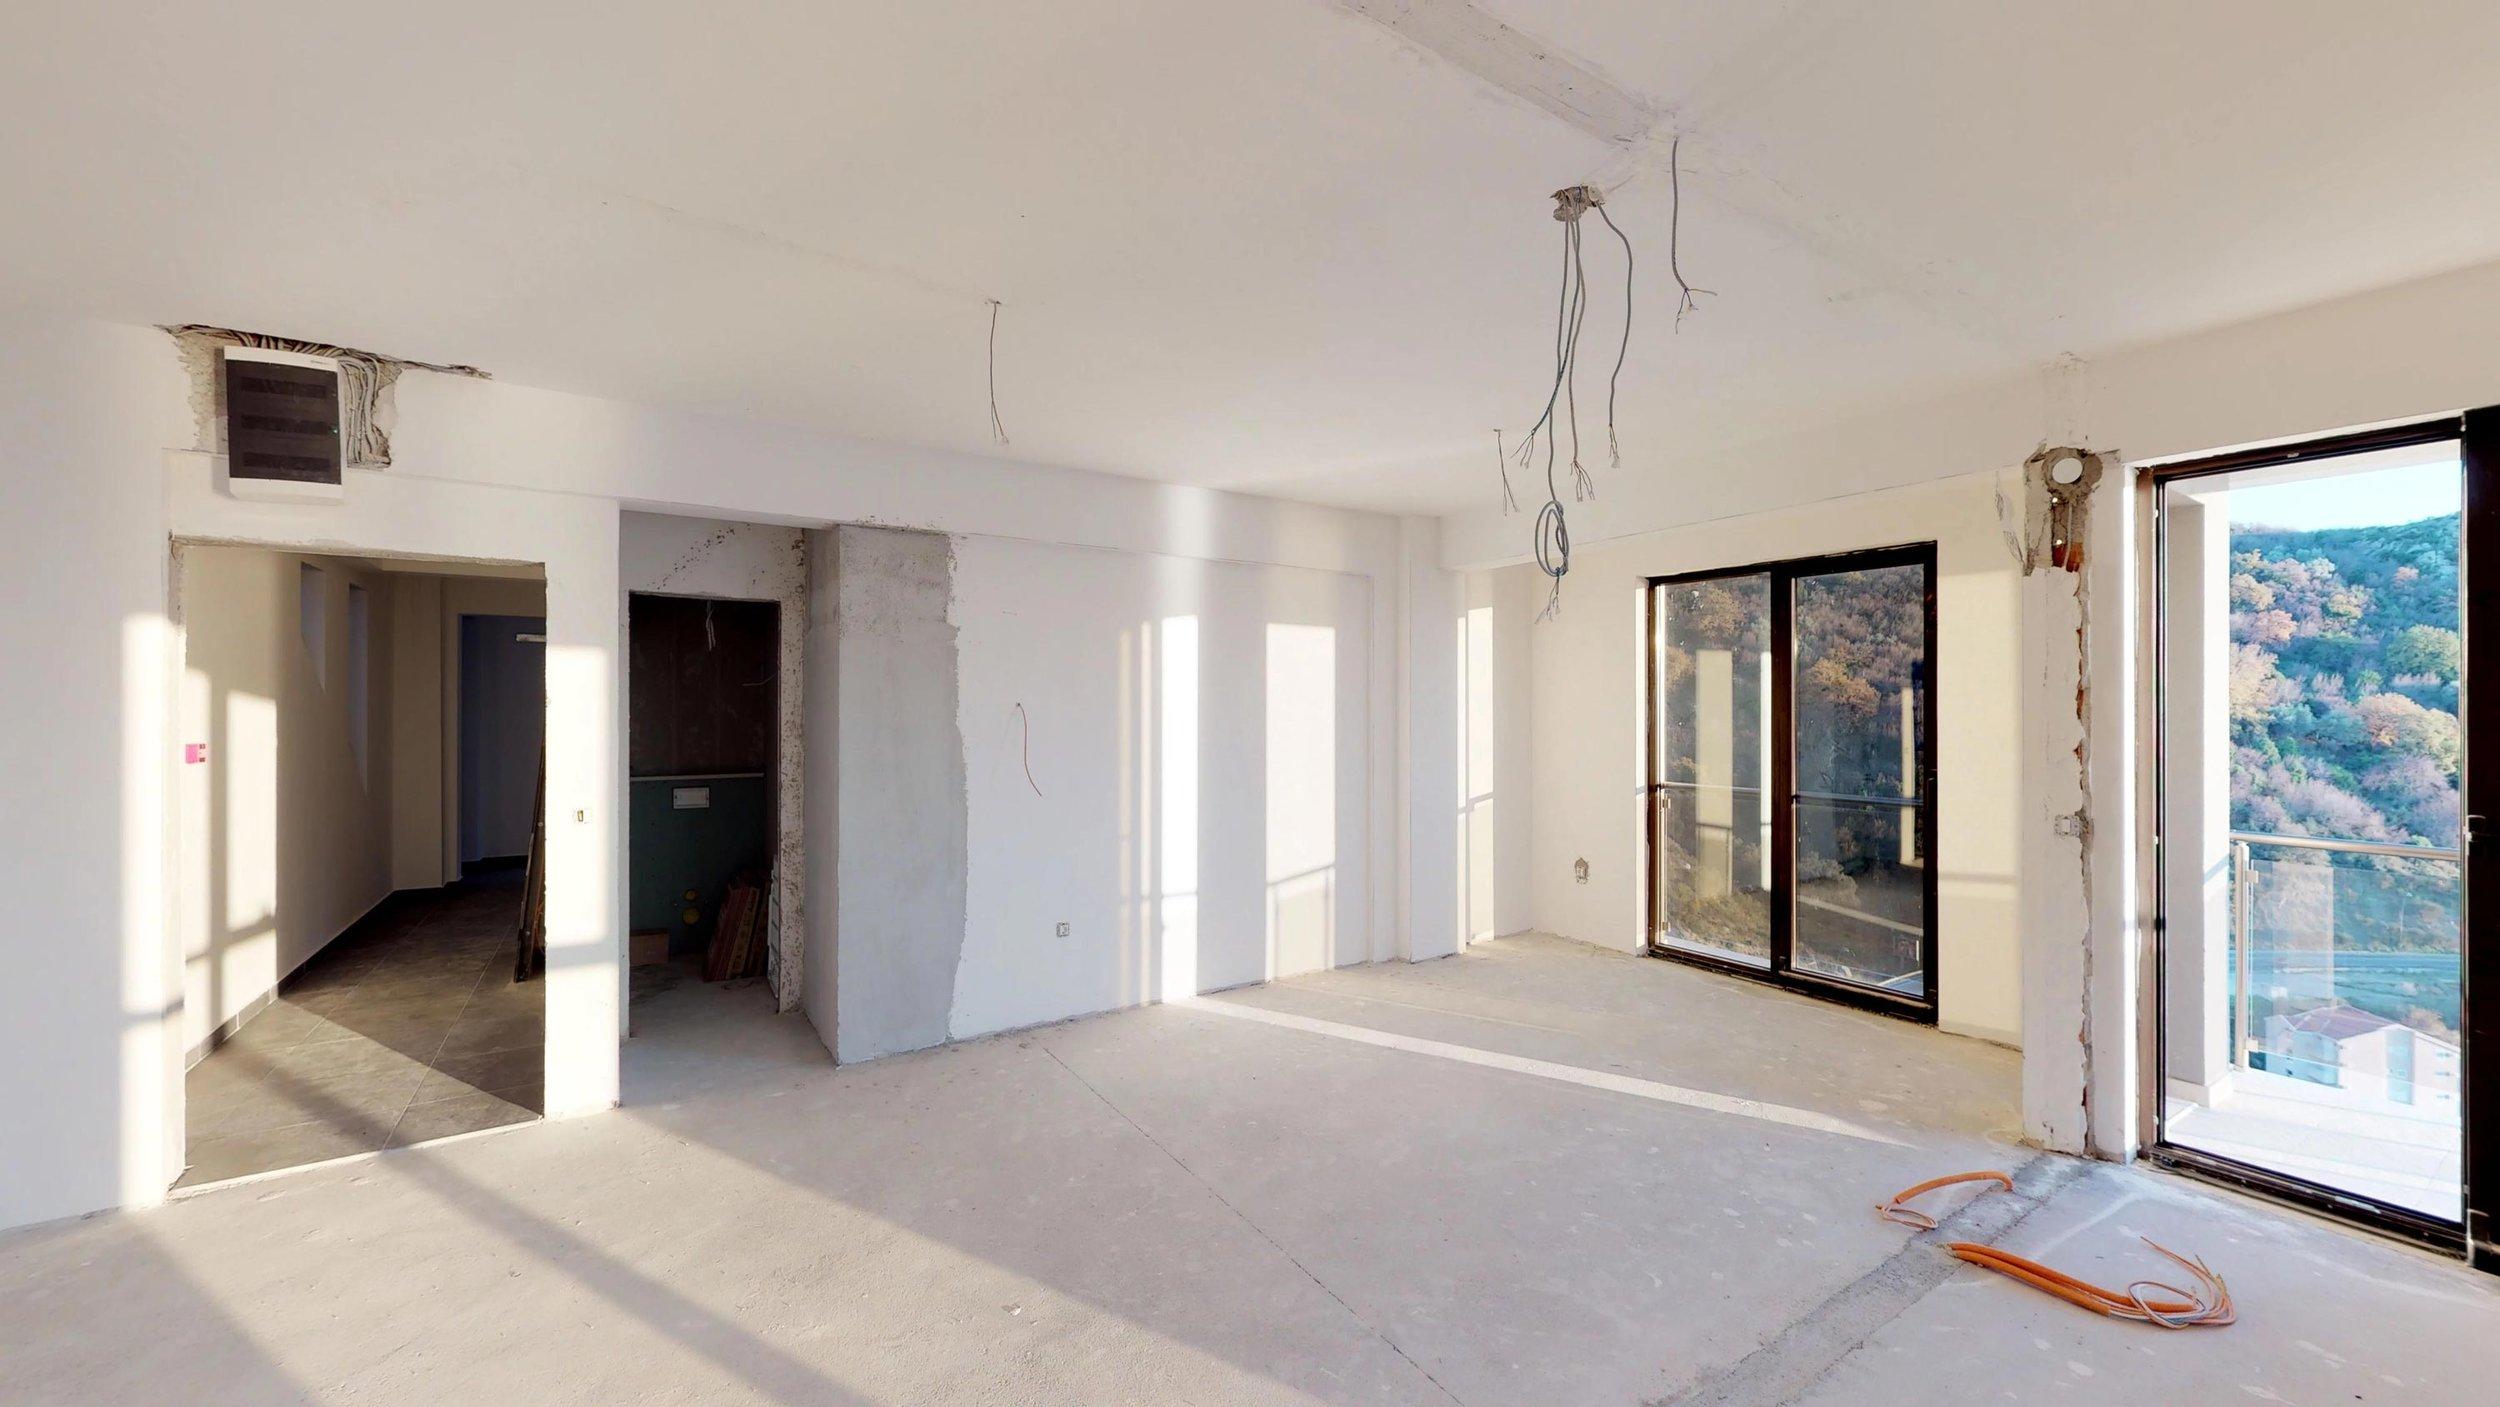 Penthouse-for-sale-in-rafailovice-Montenegro-(8).jpg